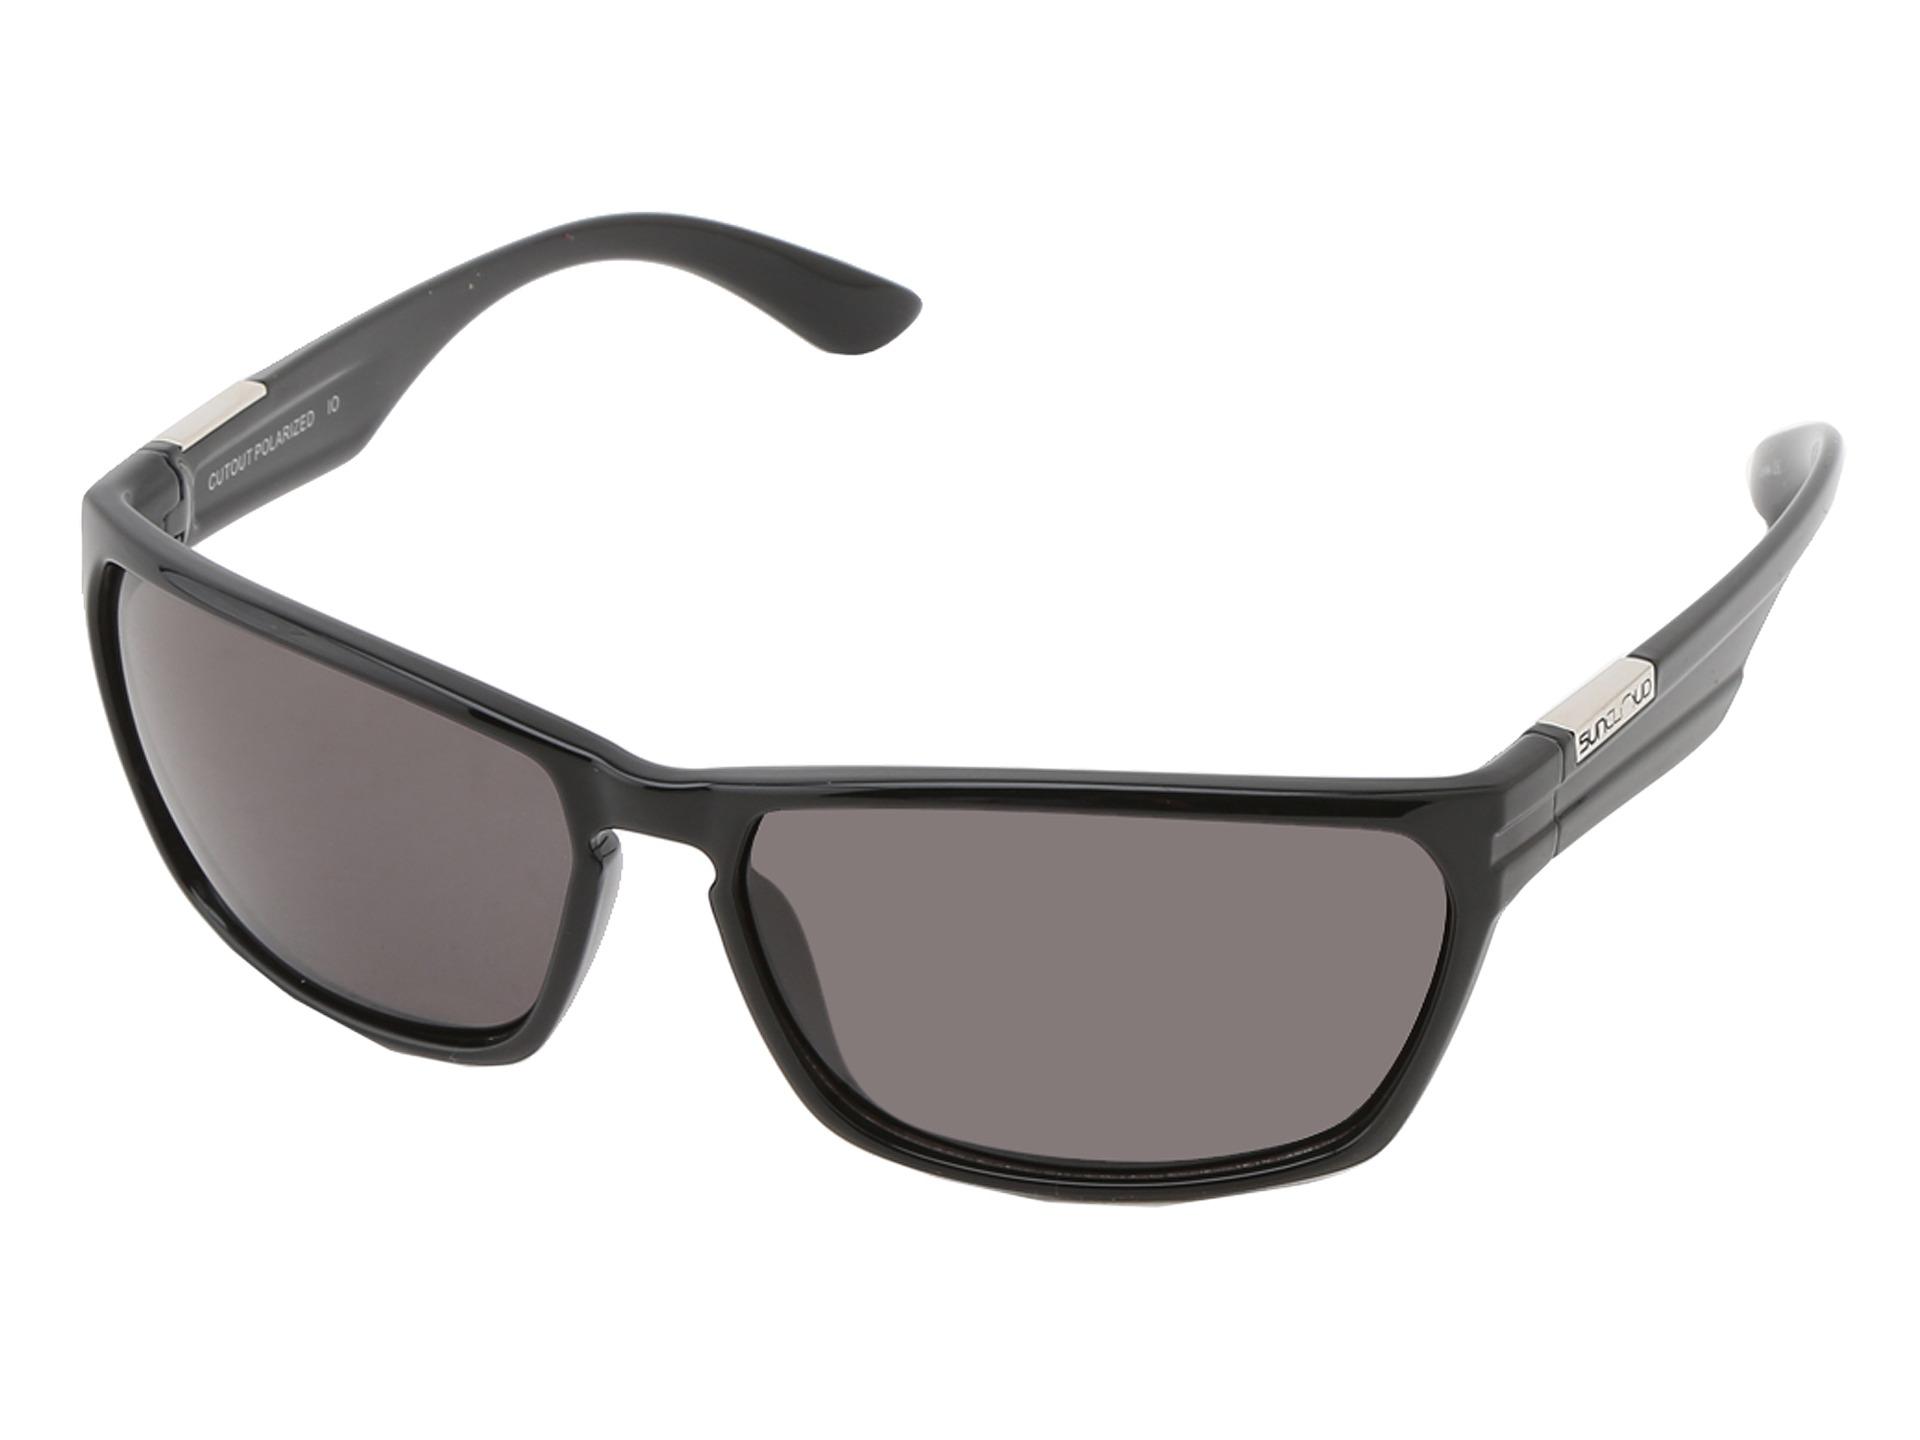 c8bba0b8eb Suncloud Cutout Sunglasses Review